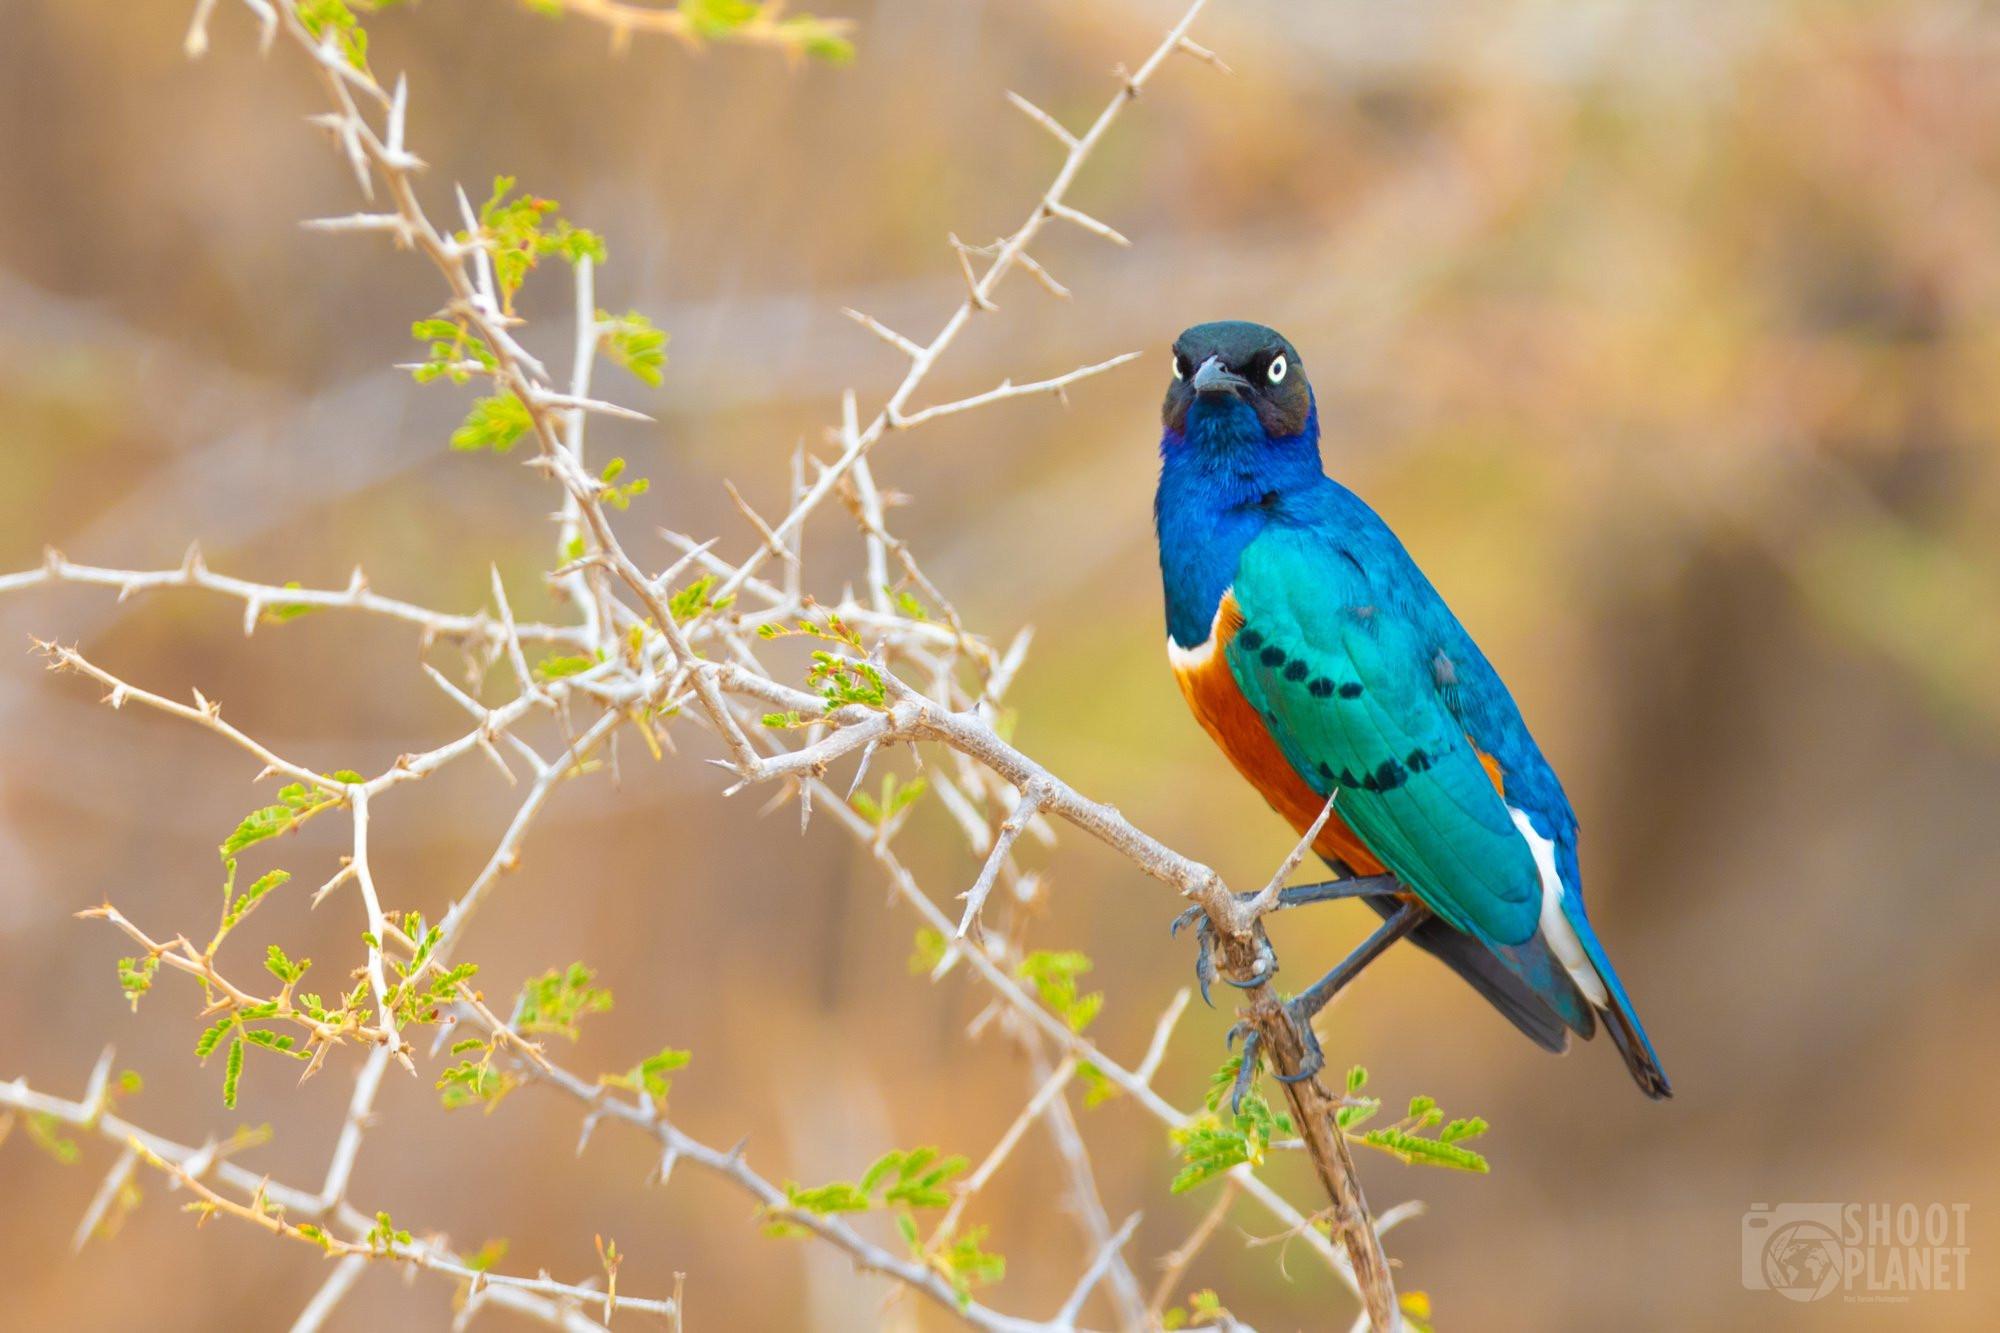 Starling bird in Tarangire National Park, Tanzania